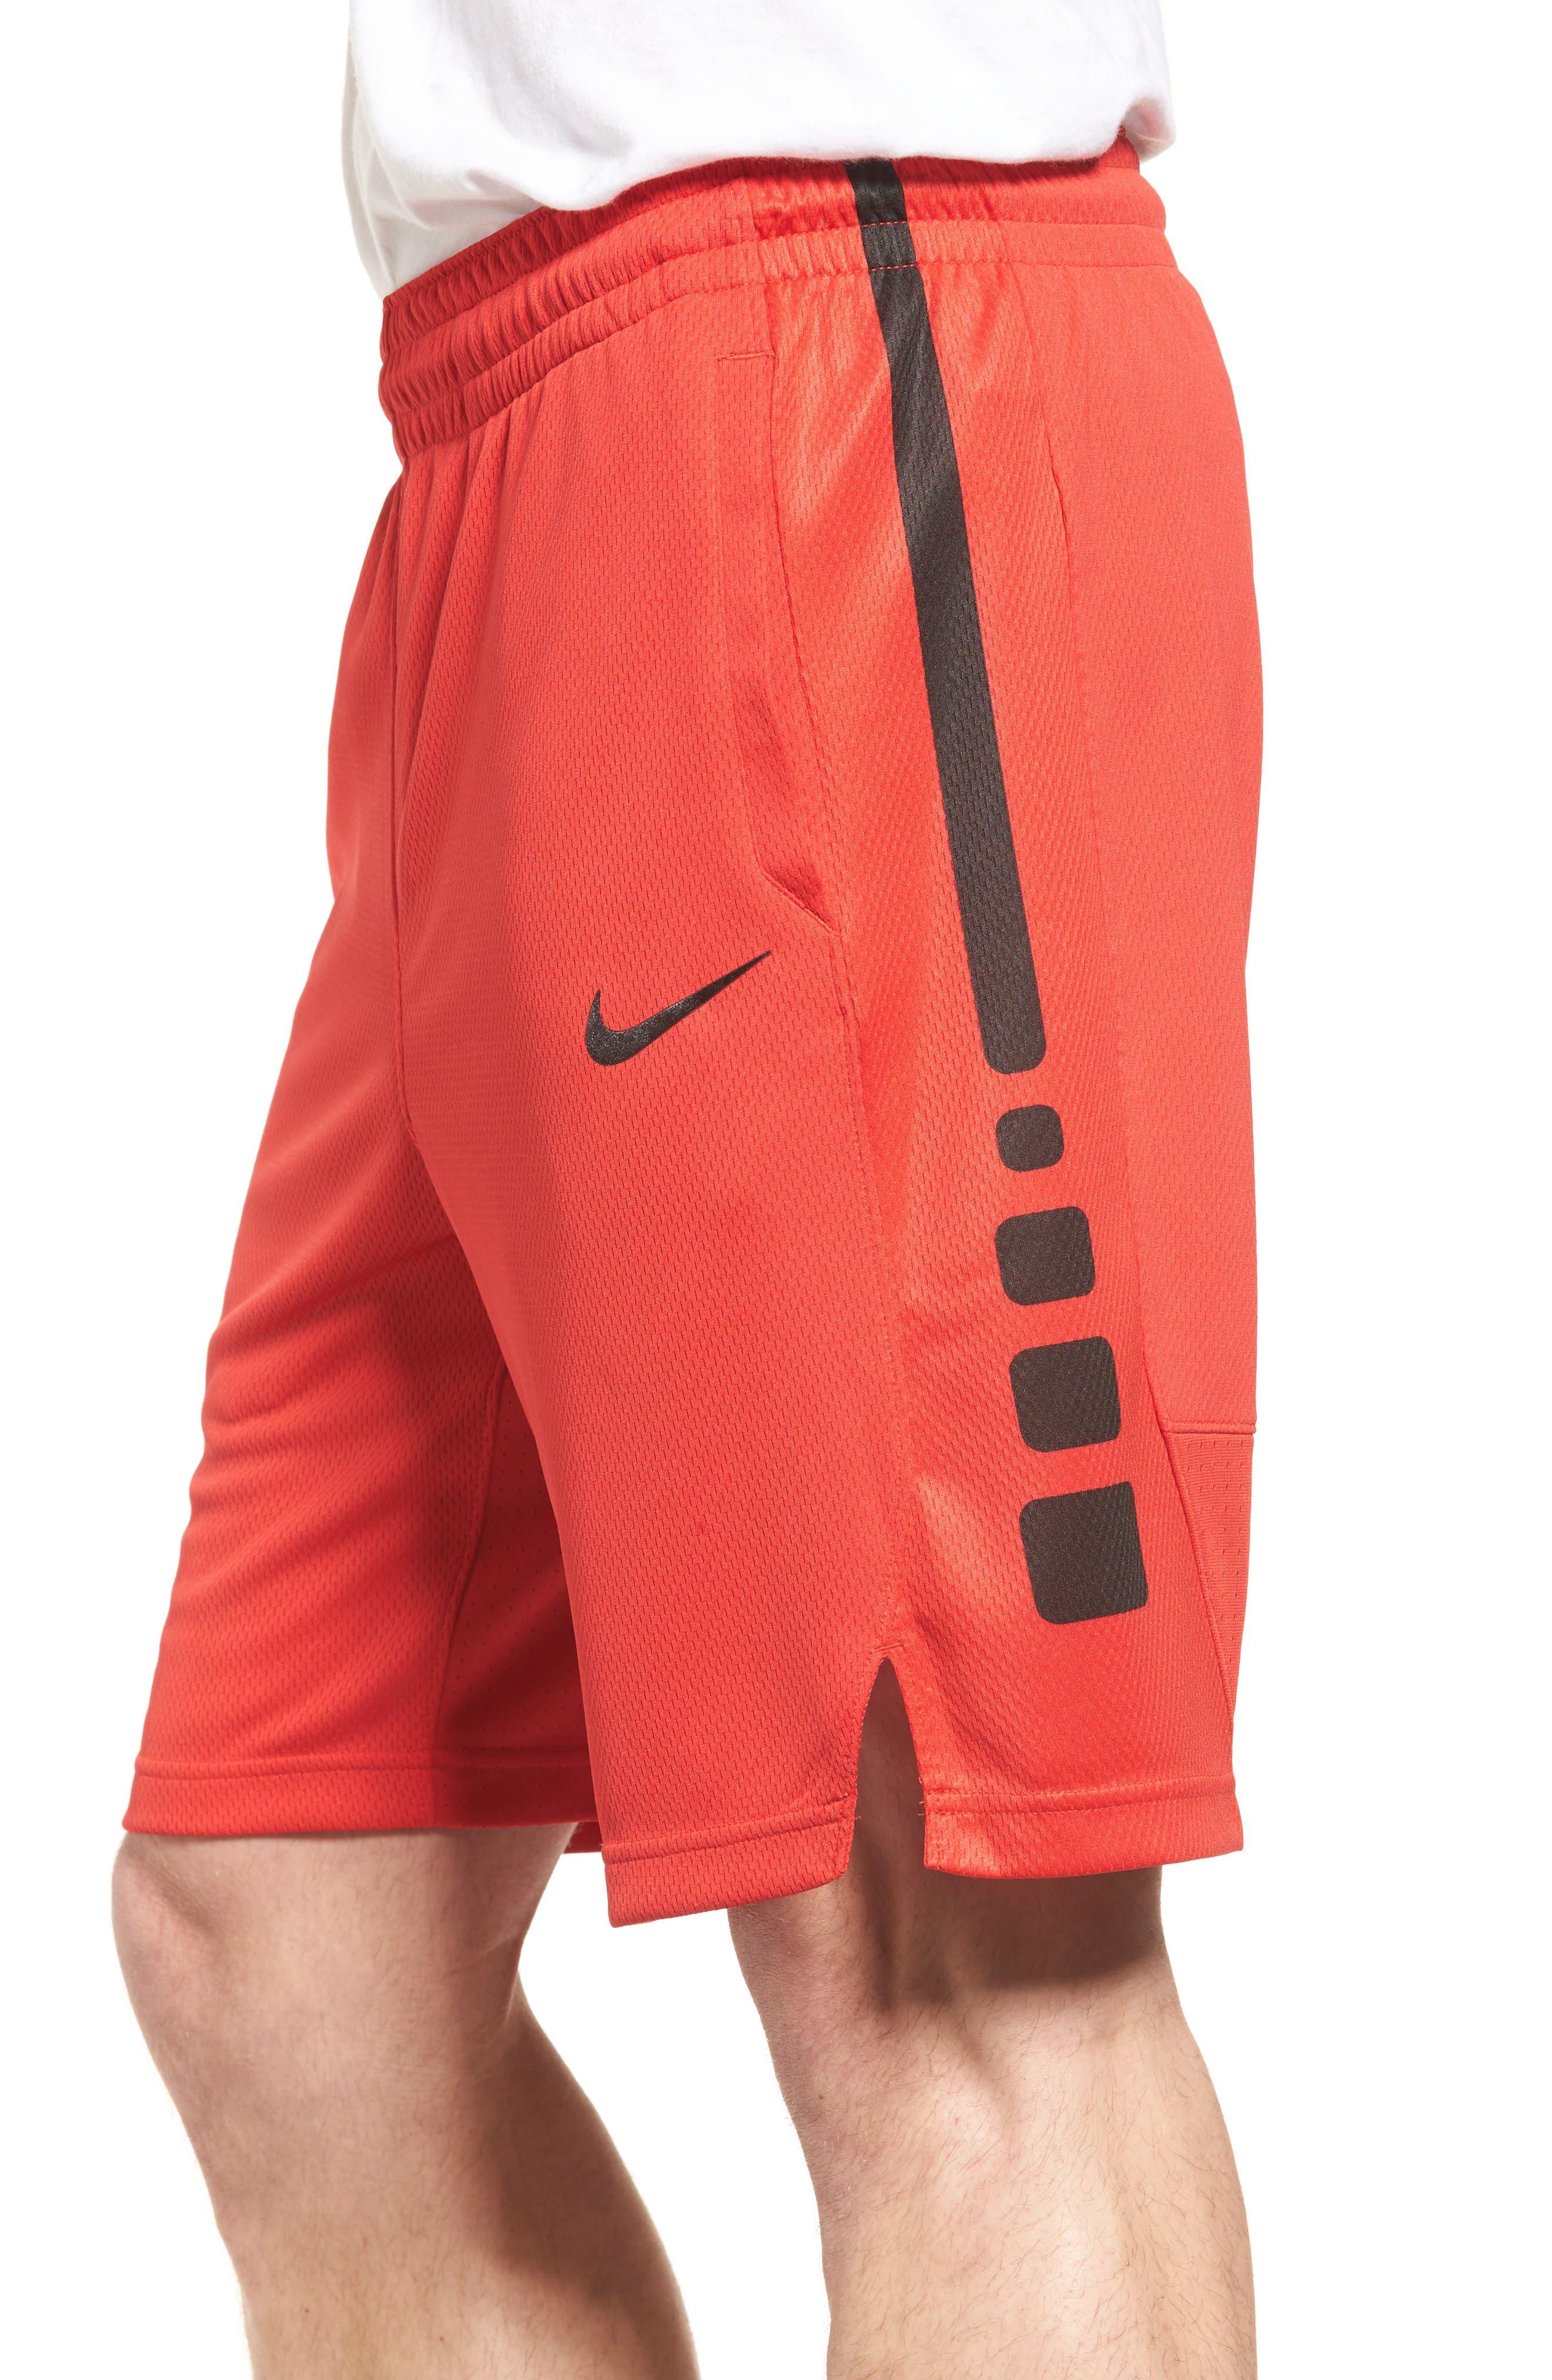 Elite Stripe Basketball Shorts,                             Alternate thumbnail 4, color,                             UNIVERSITY RED/ BLACK